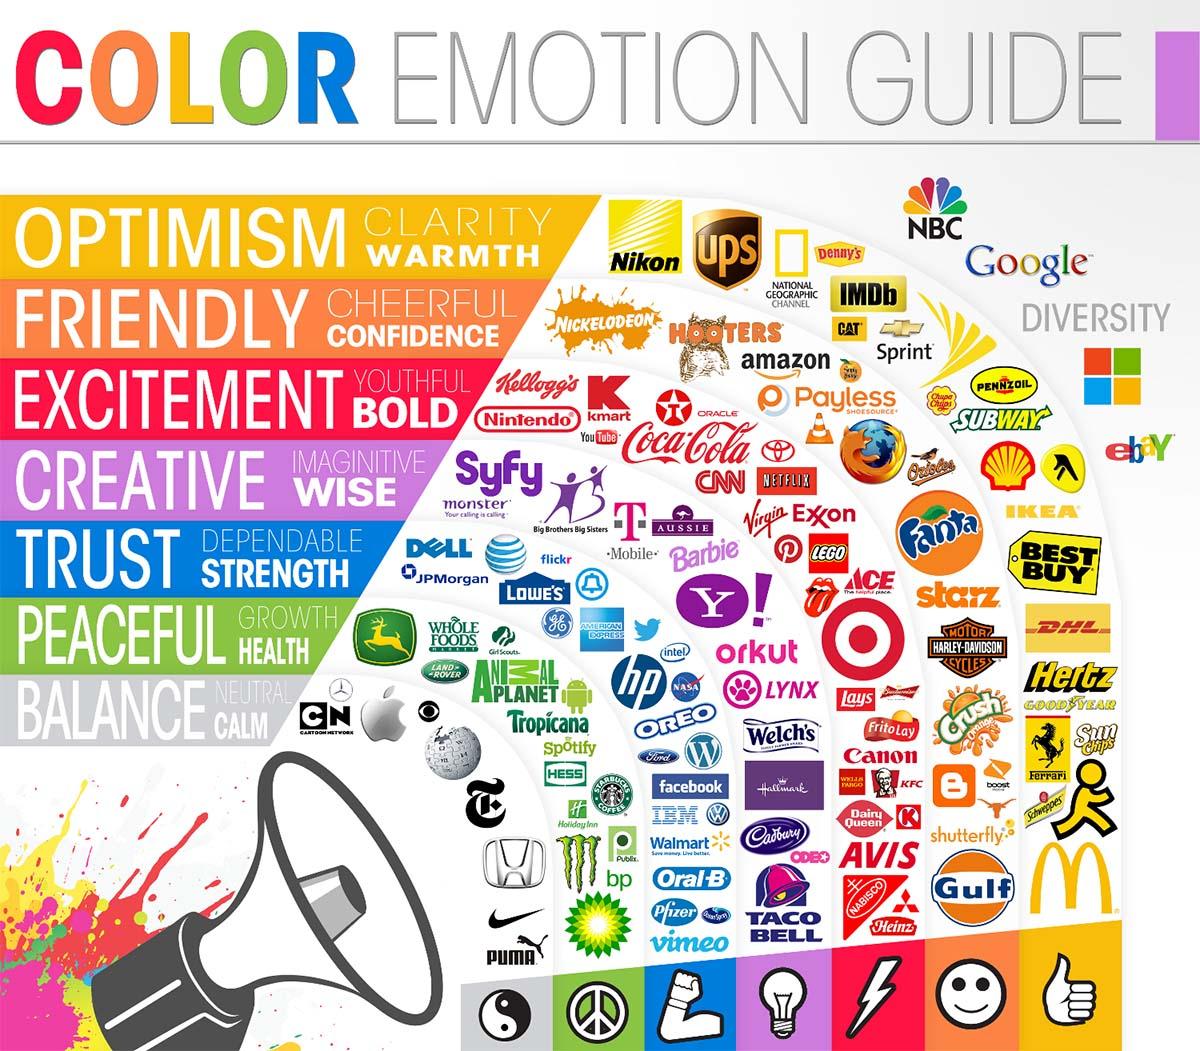 color emotion guide, logo, logotype, branding, marketing, rh technology